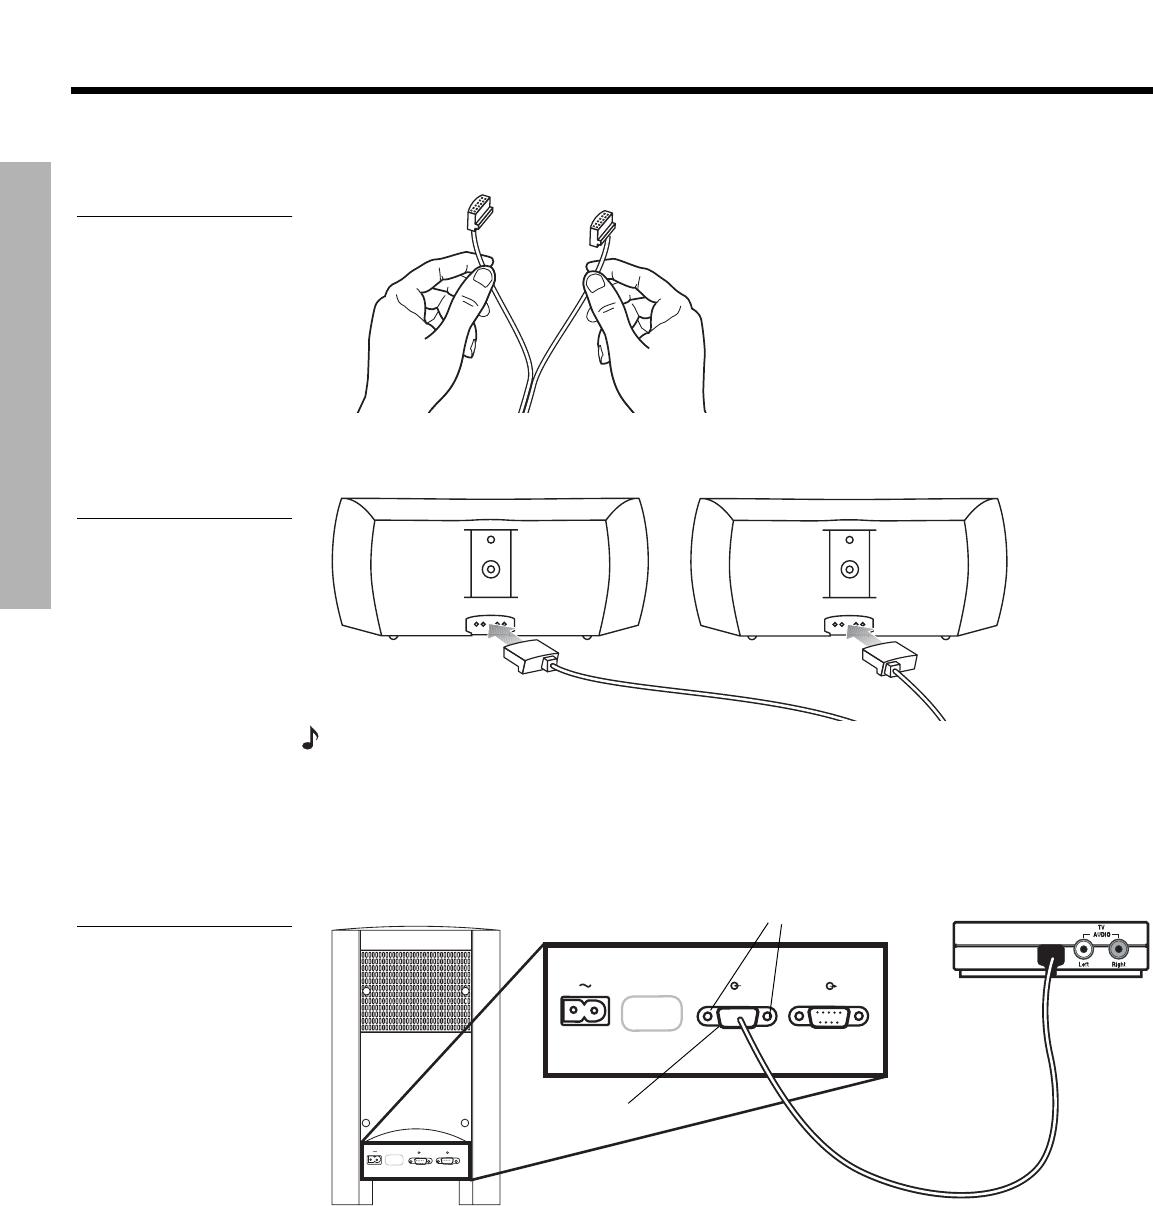 Bose Cinemate Wiring Diagram - Citroen C4 Bsi Wiring Diagram -  vww-69.nescafe.jeanjaures37.fr